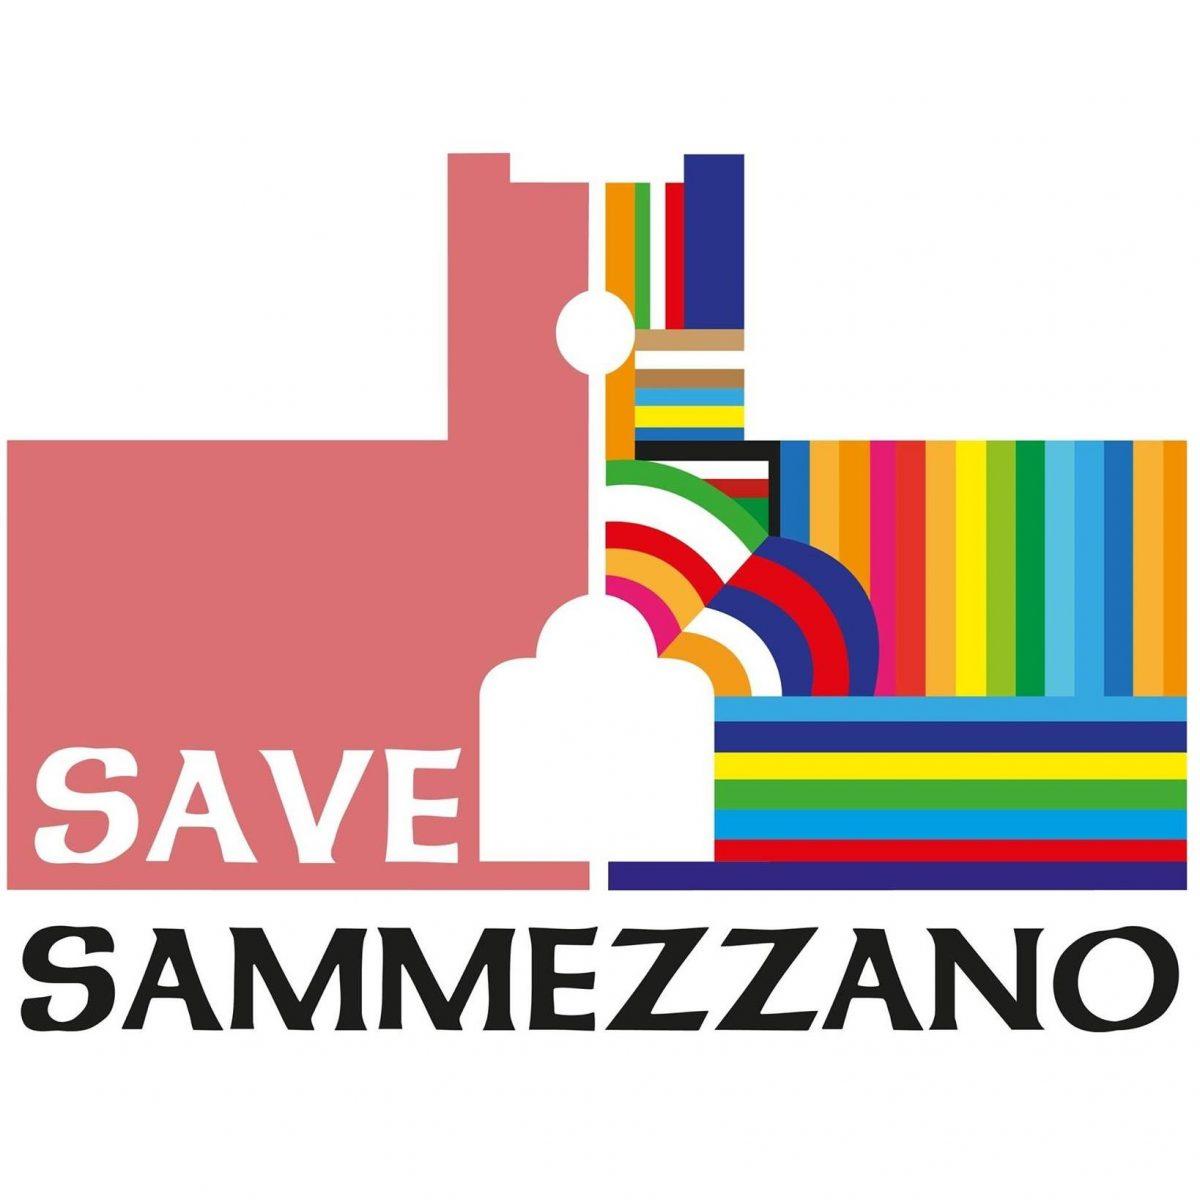 SaveSammezzano.com l'ultima opera del team di Elab13